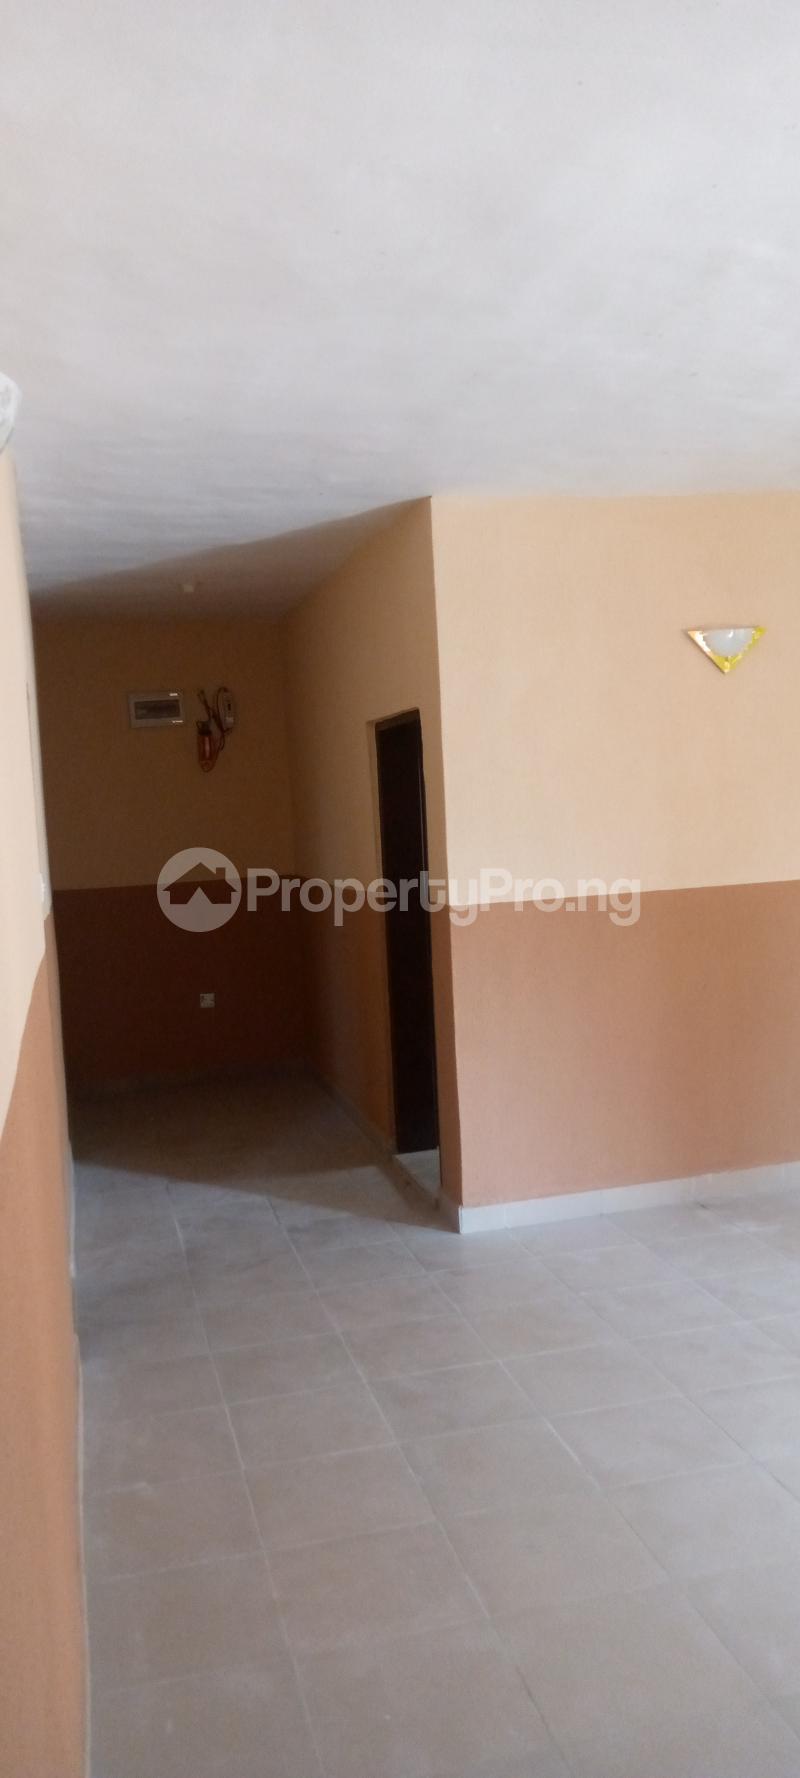 3 bedroom Blocks of Flats House for rent Basin area Ilorin Kwara - 2